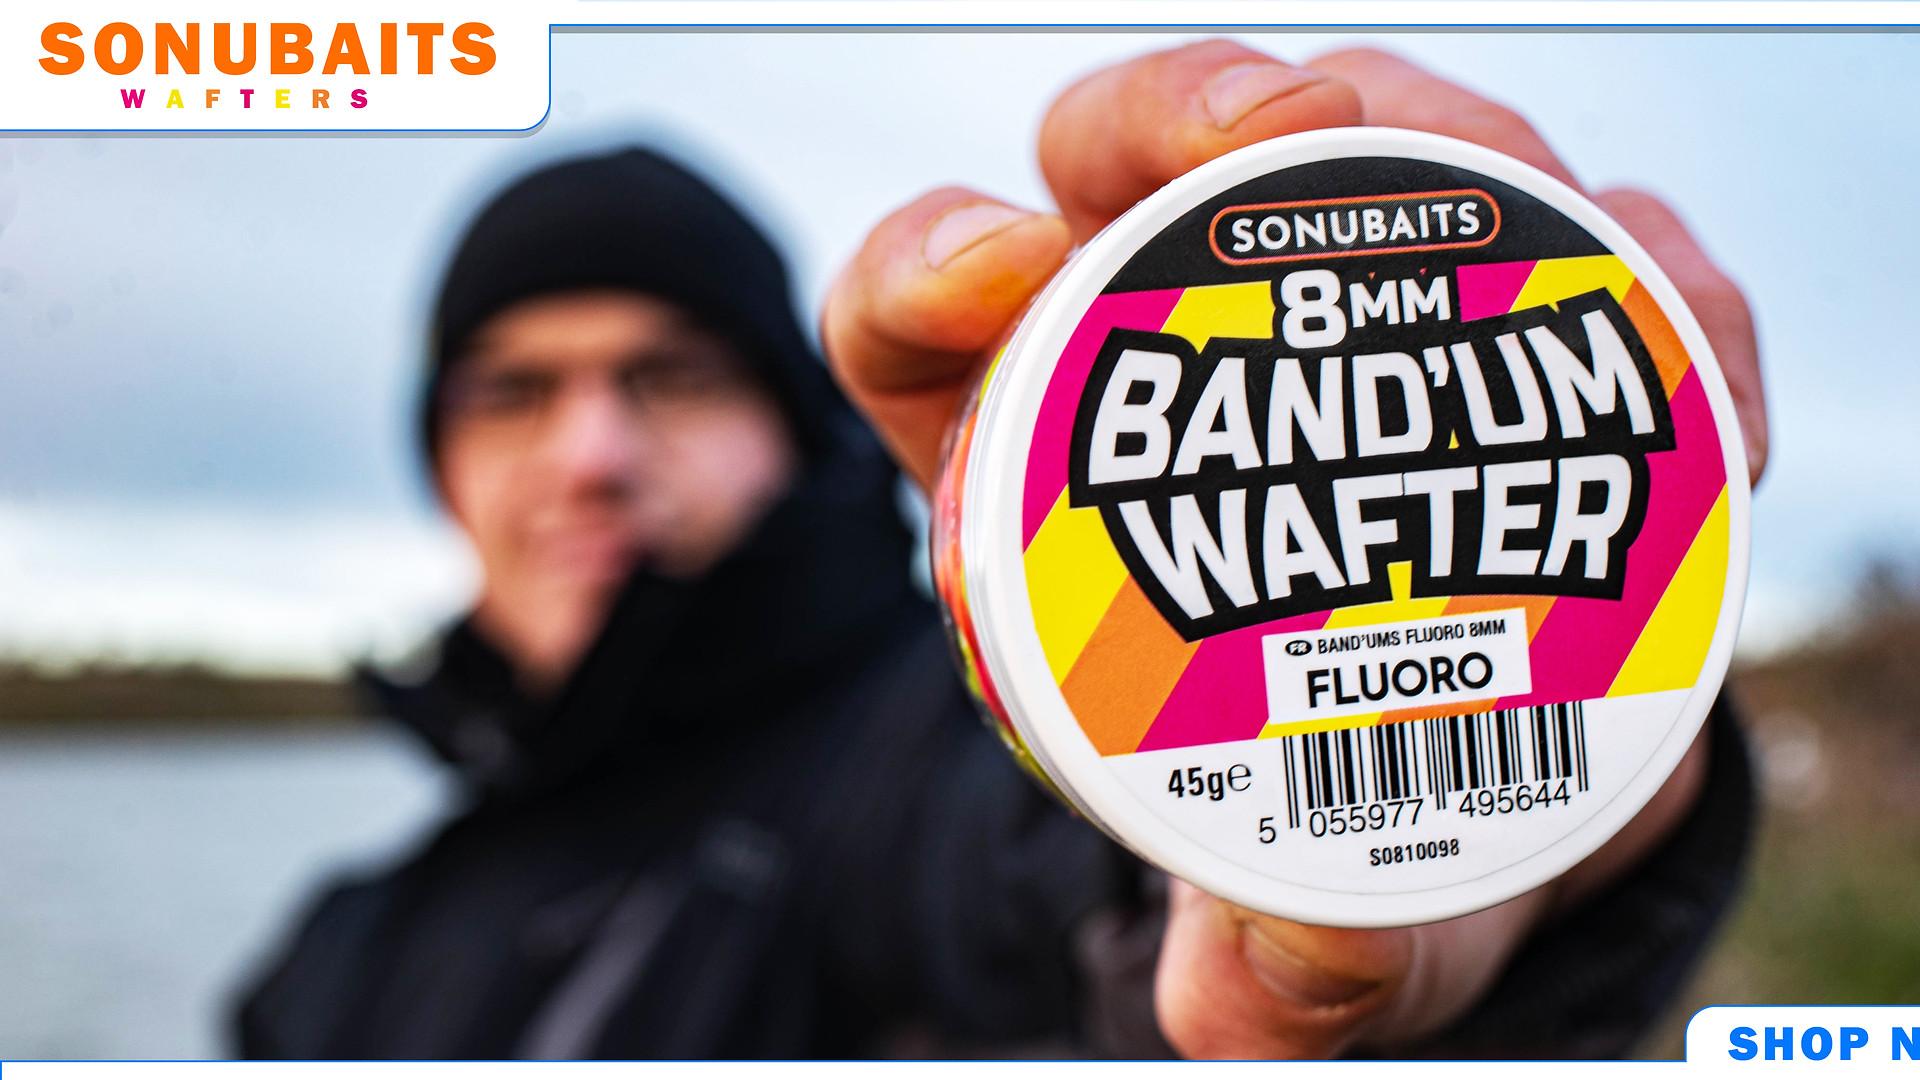 Sonubaits Wafters